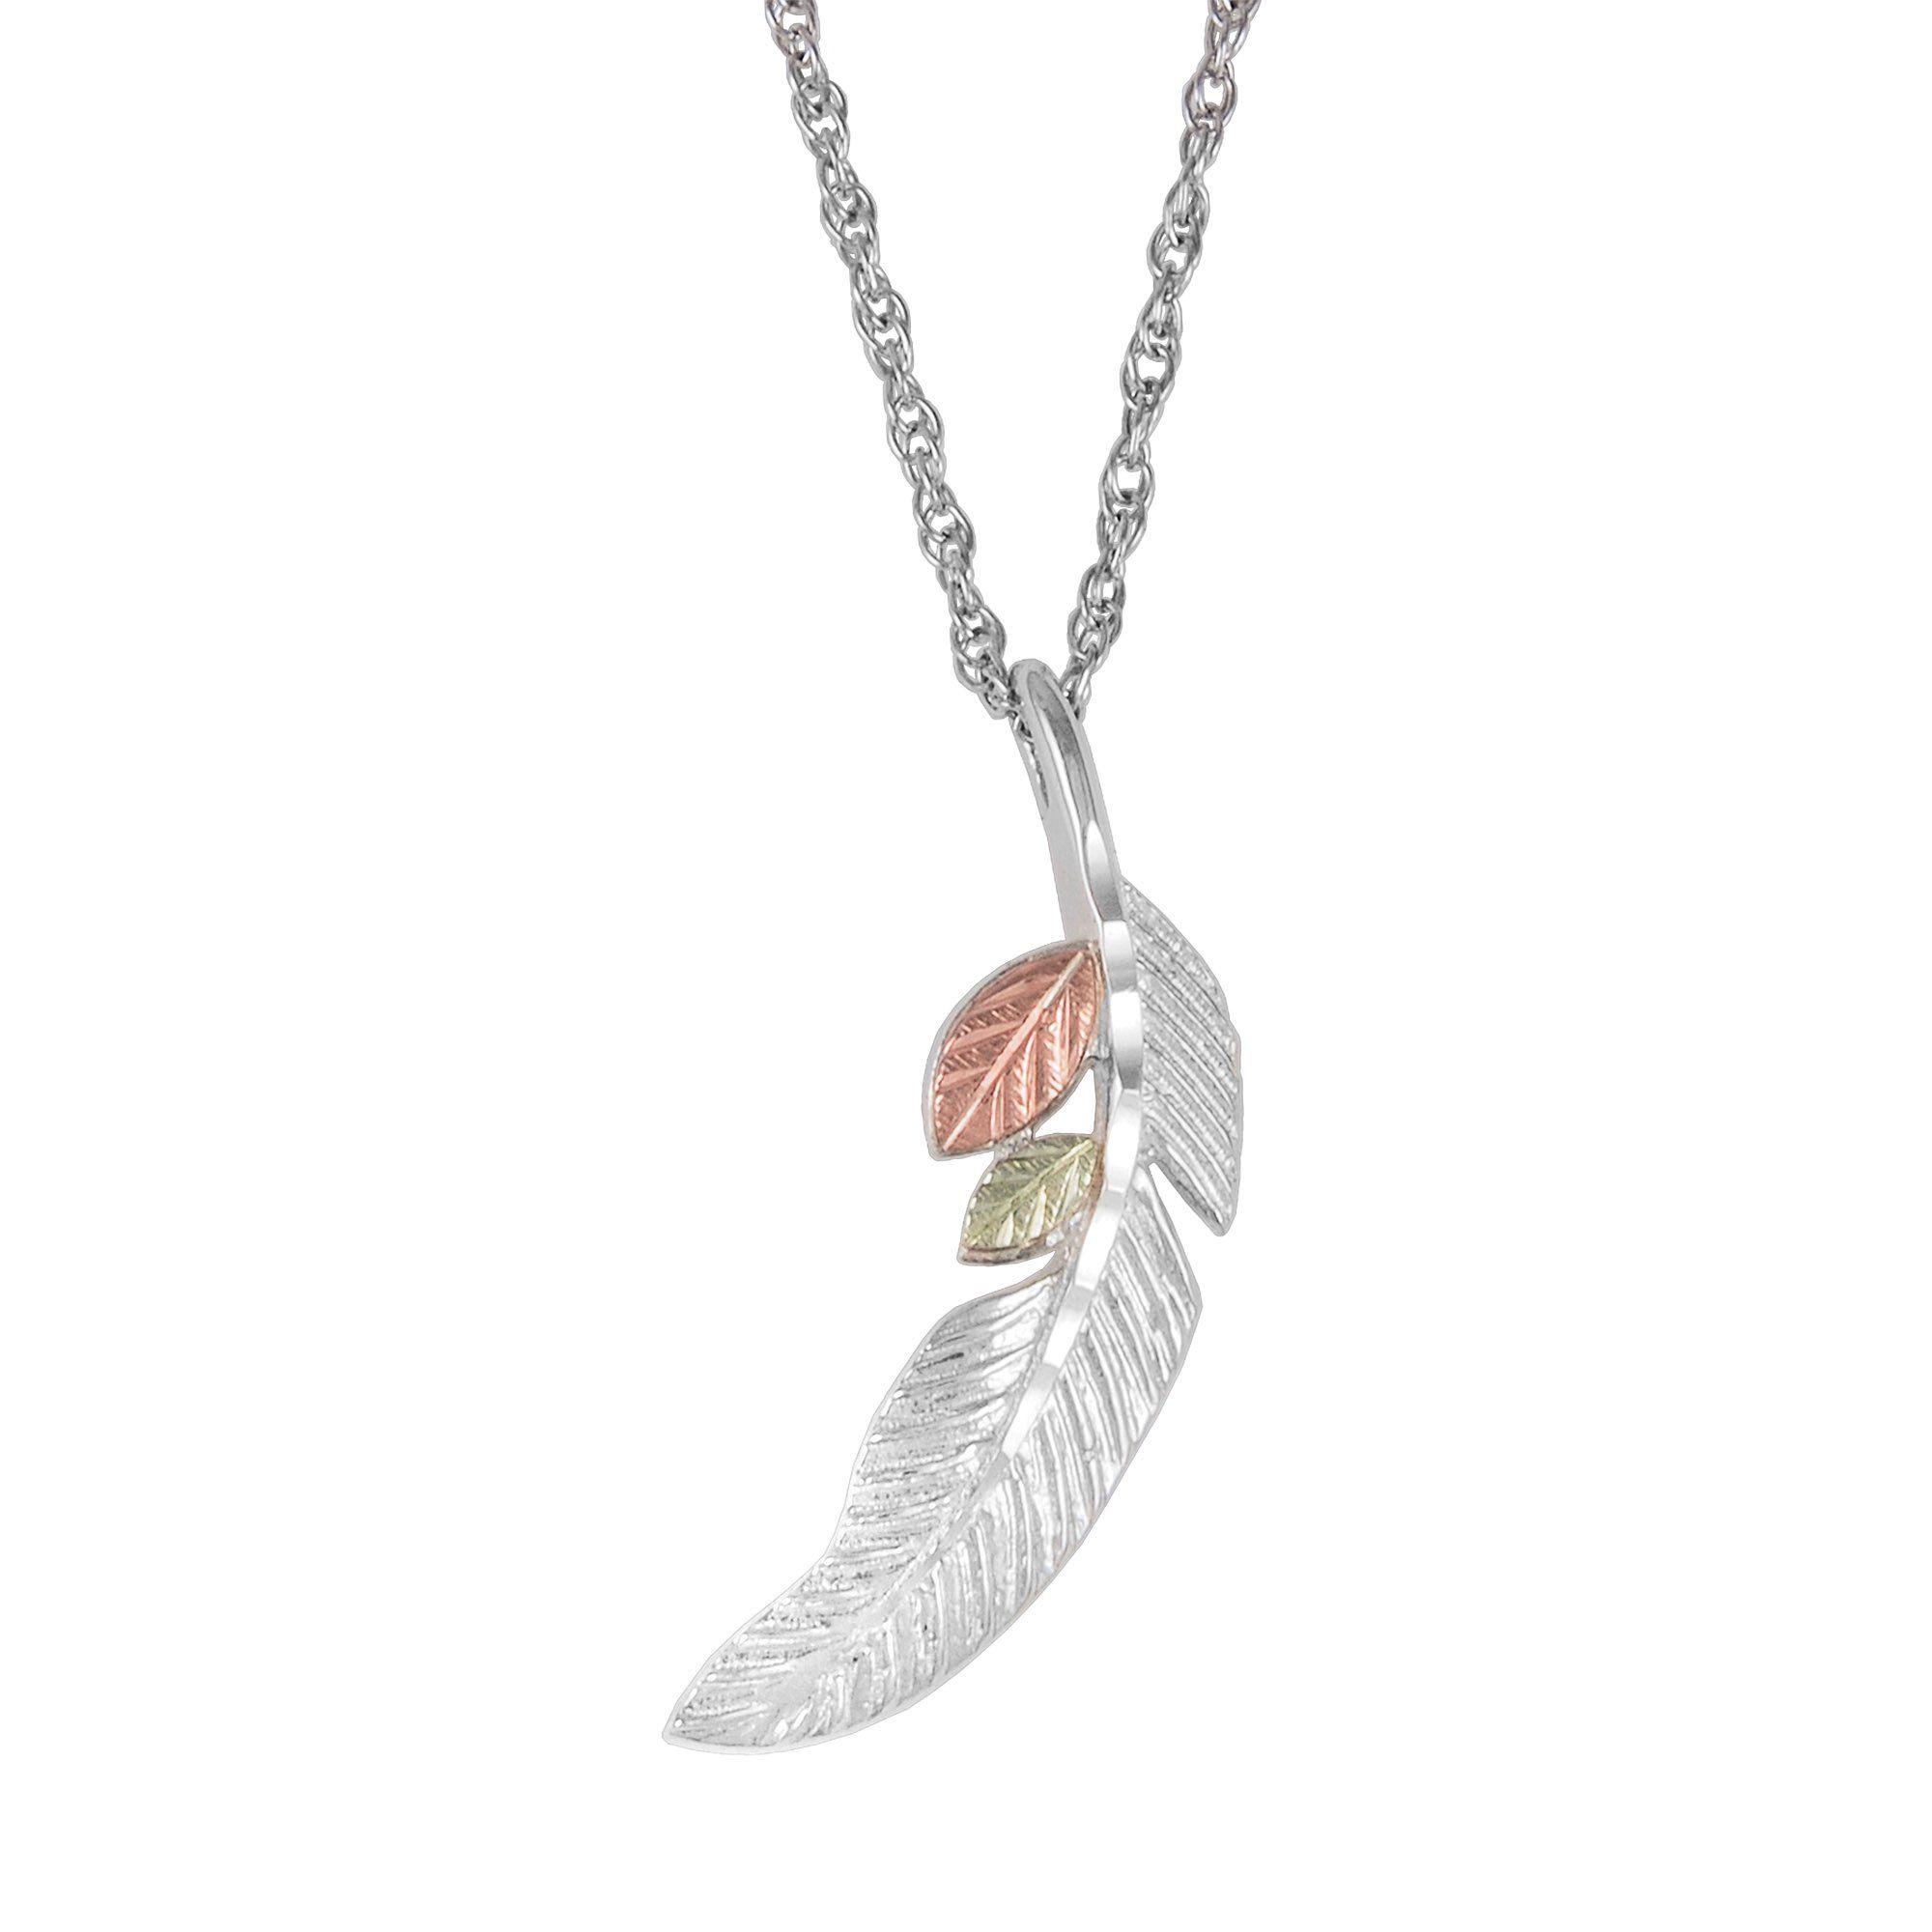 Sterling feather pendant necklace black hills gold black hills sterling feather pendant necklace black hills gold aloadofball Gallery